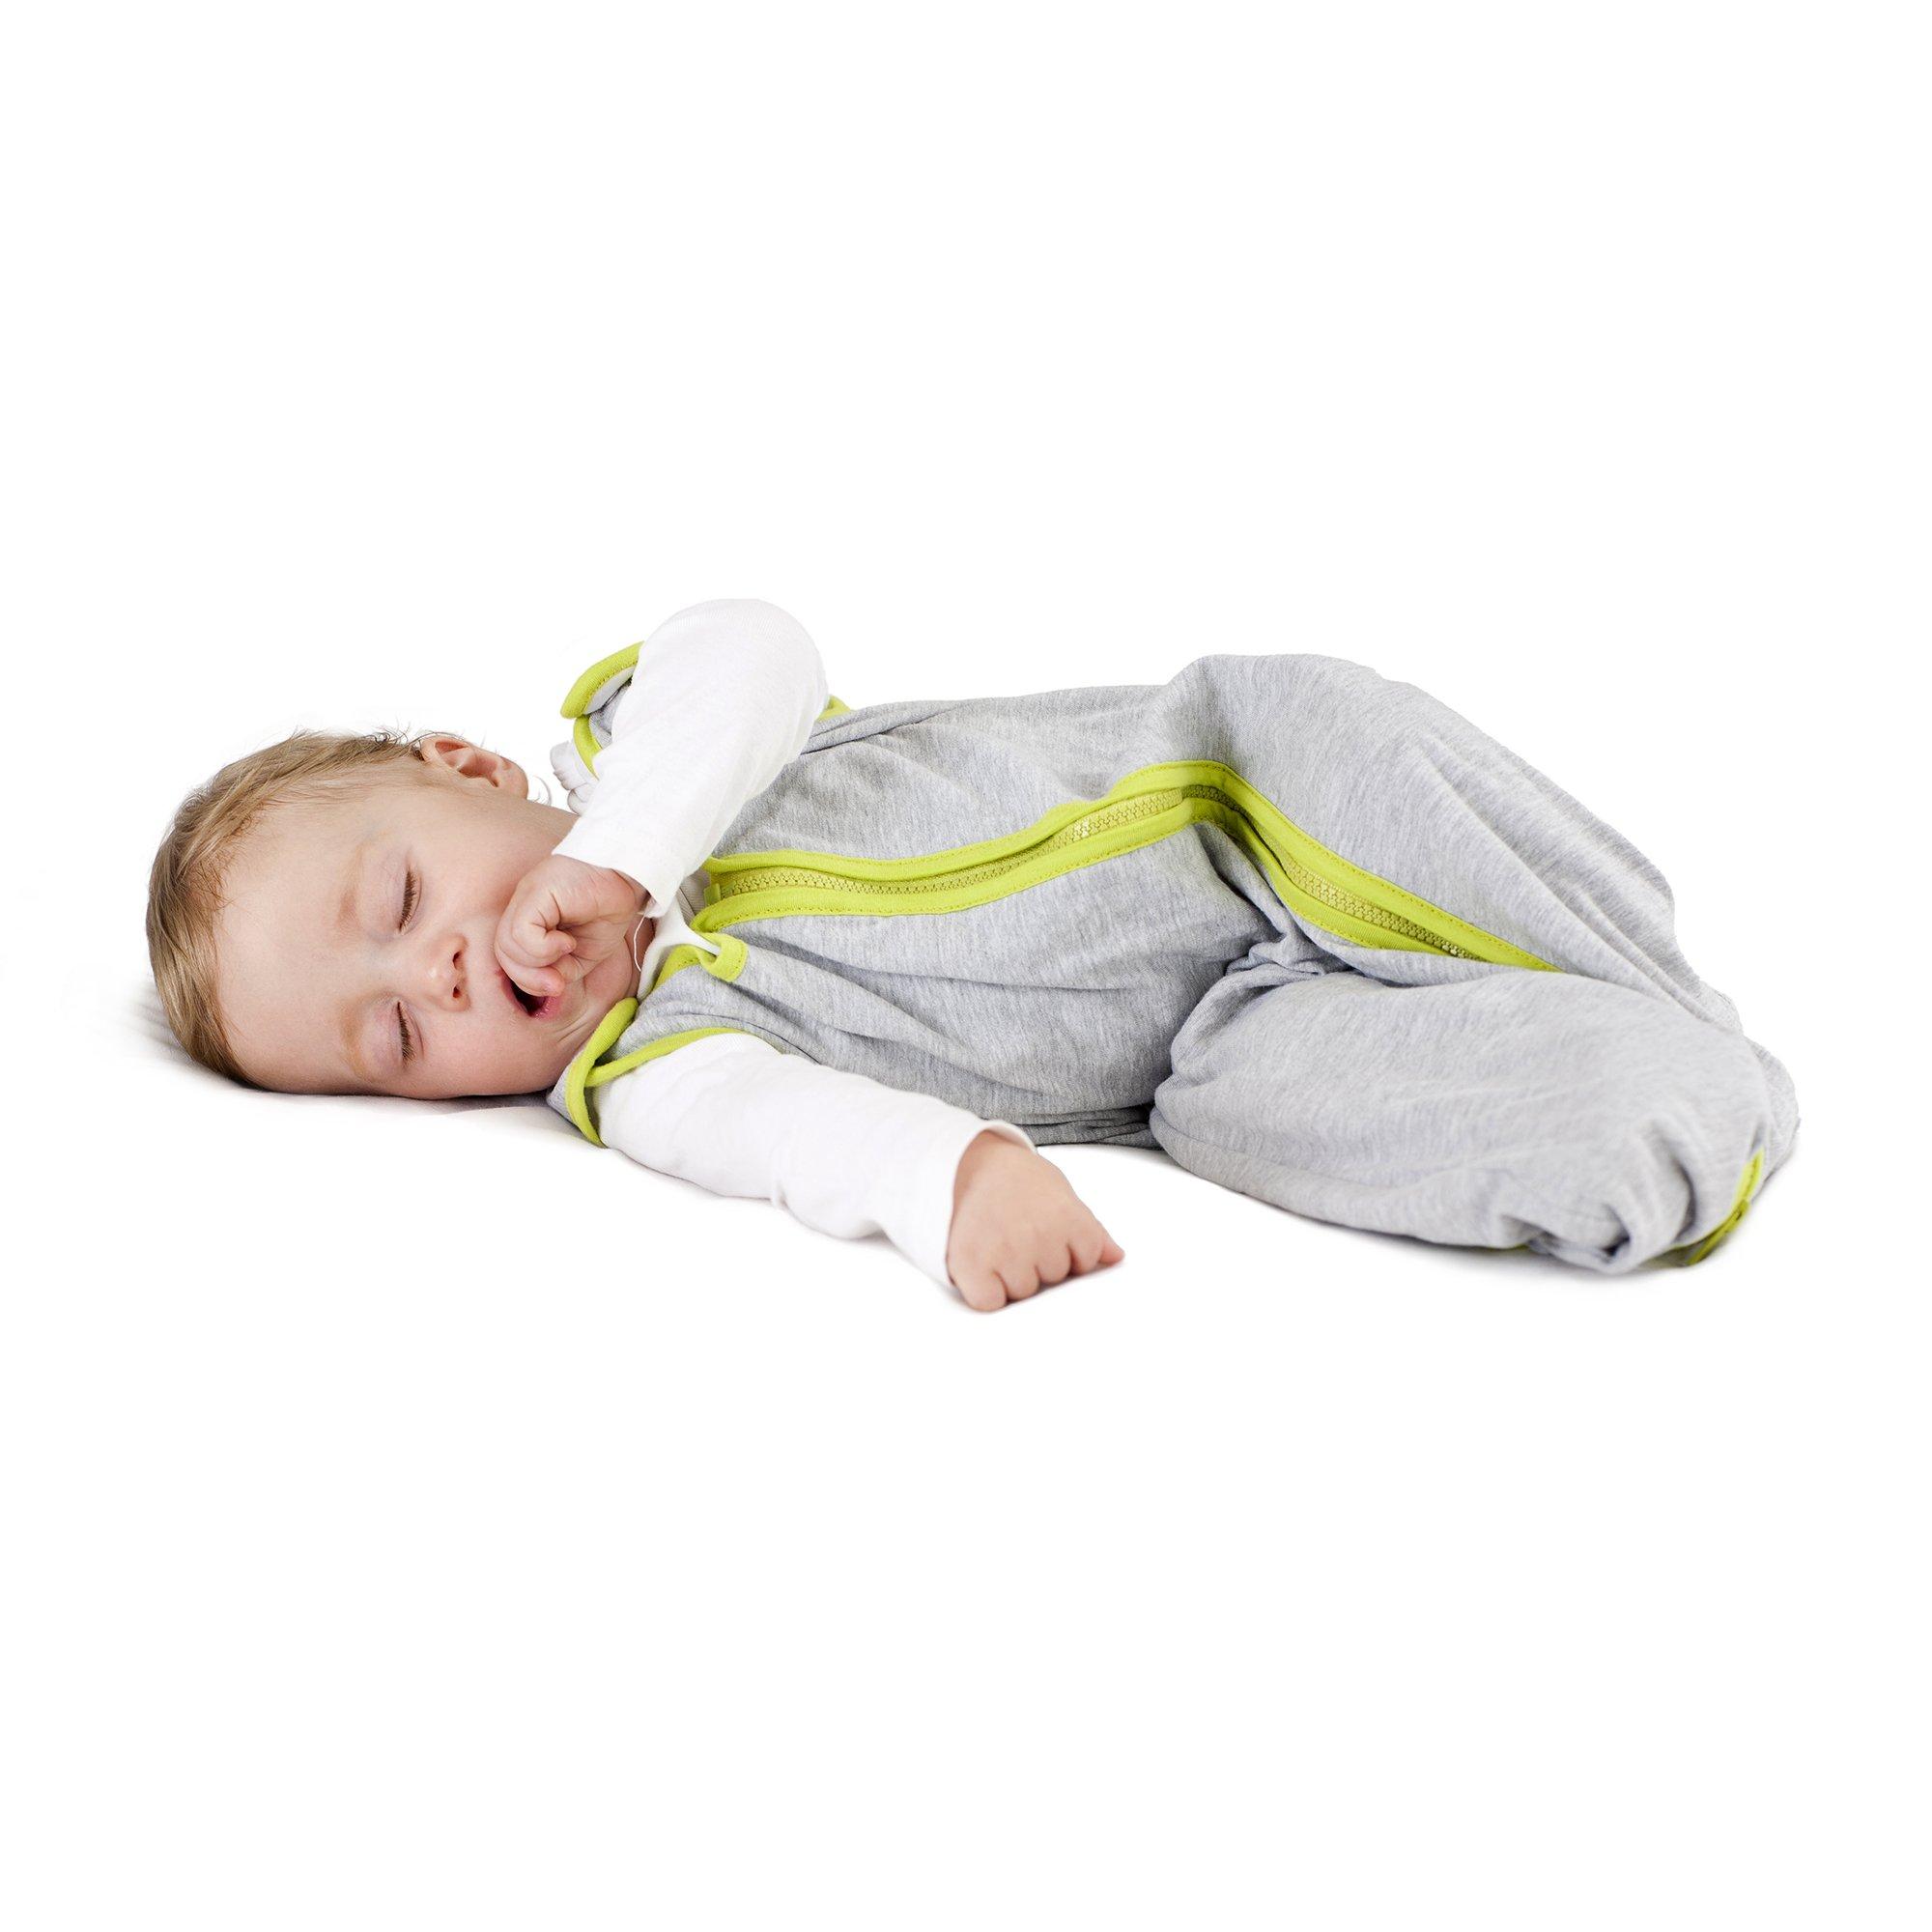 baby deedee Sleep Nest Lite Sleeping Bag Sack, Heather Gray Lime, Small (0-6 Months)